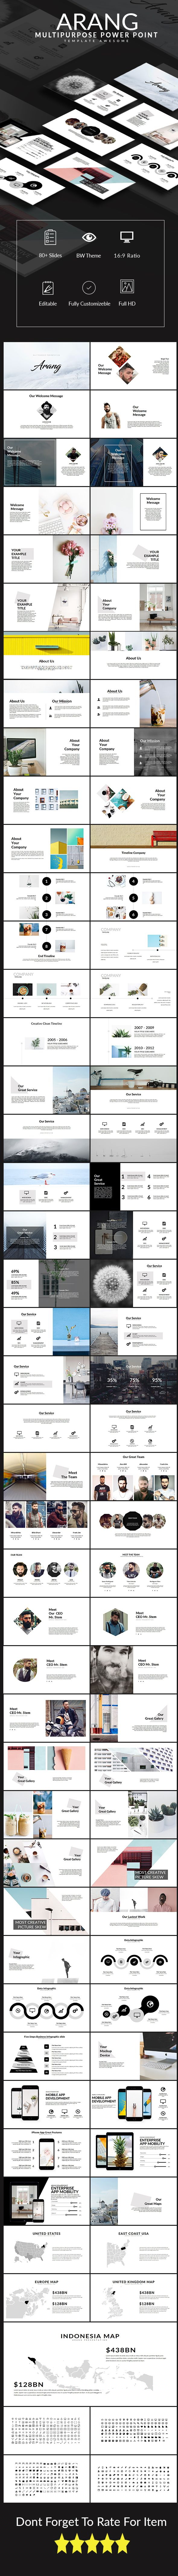 Arang Multipurpose PowerPoint Presentation Template